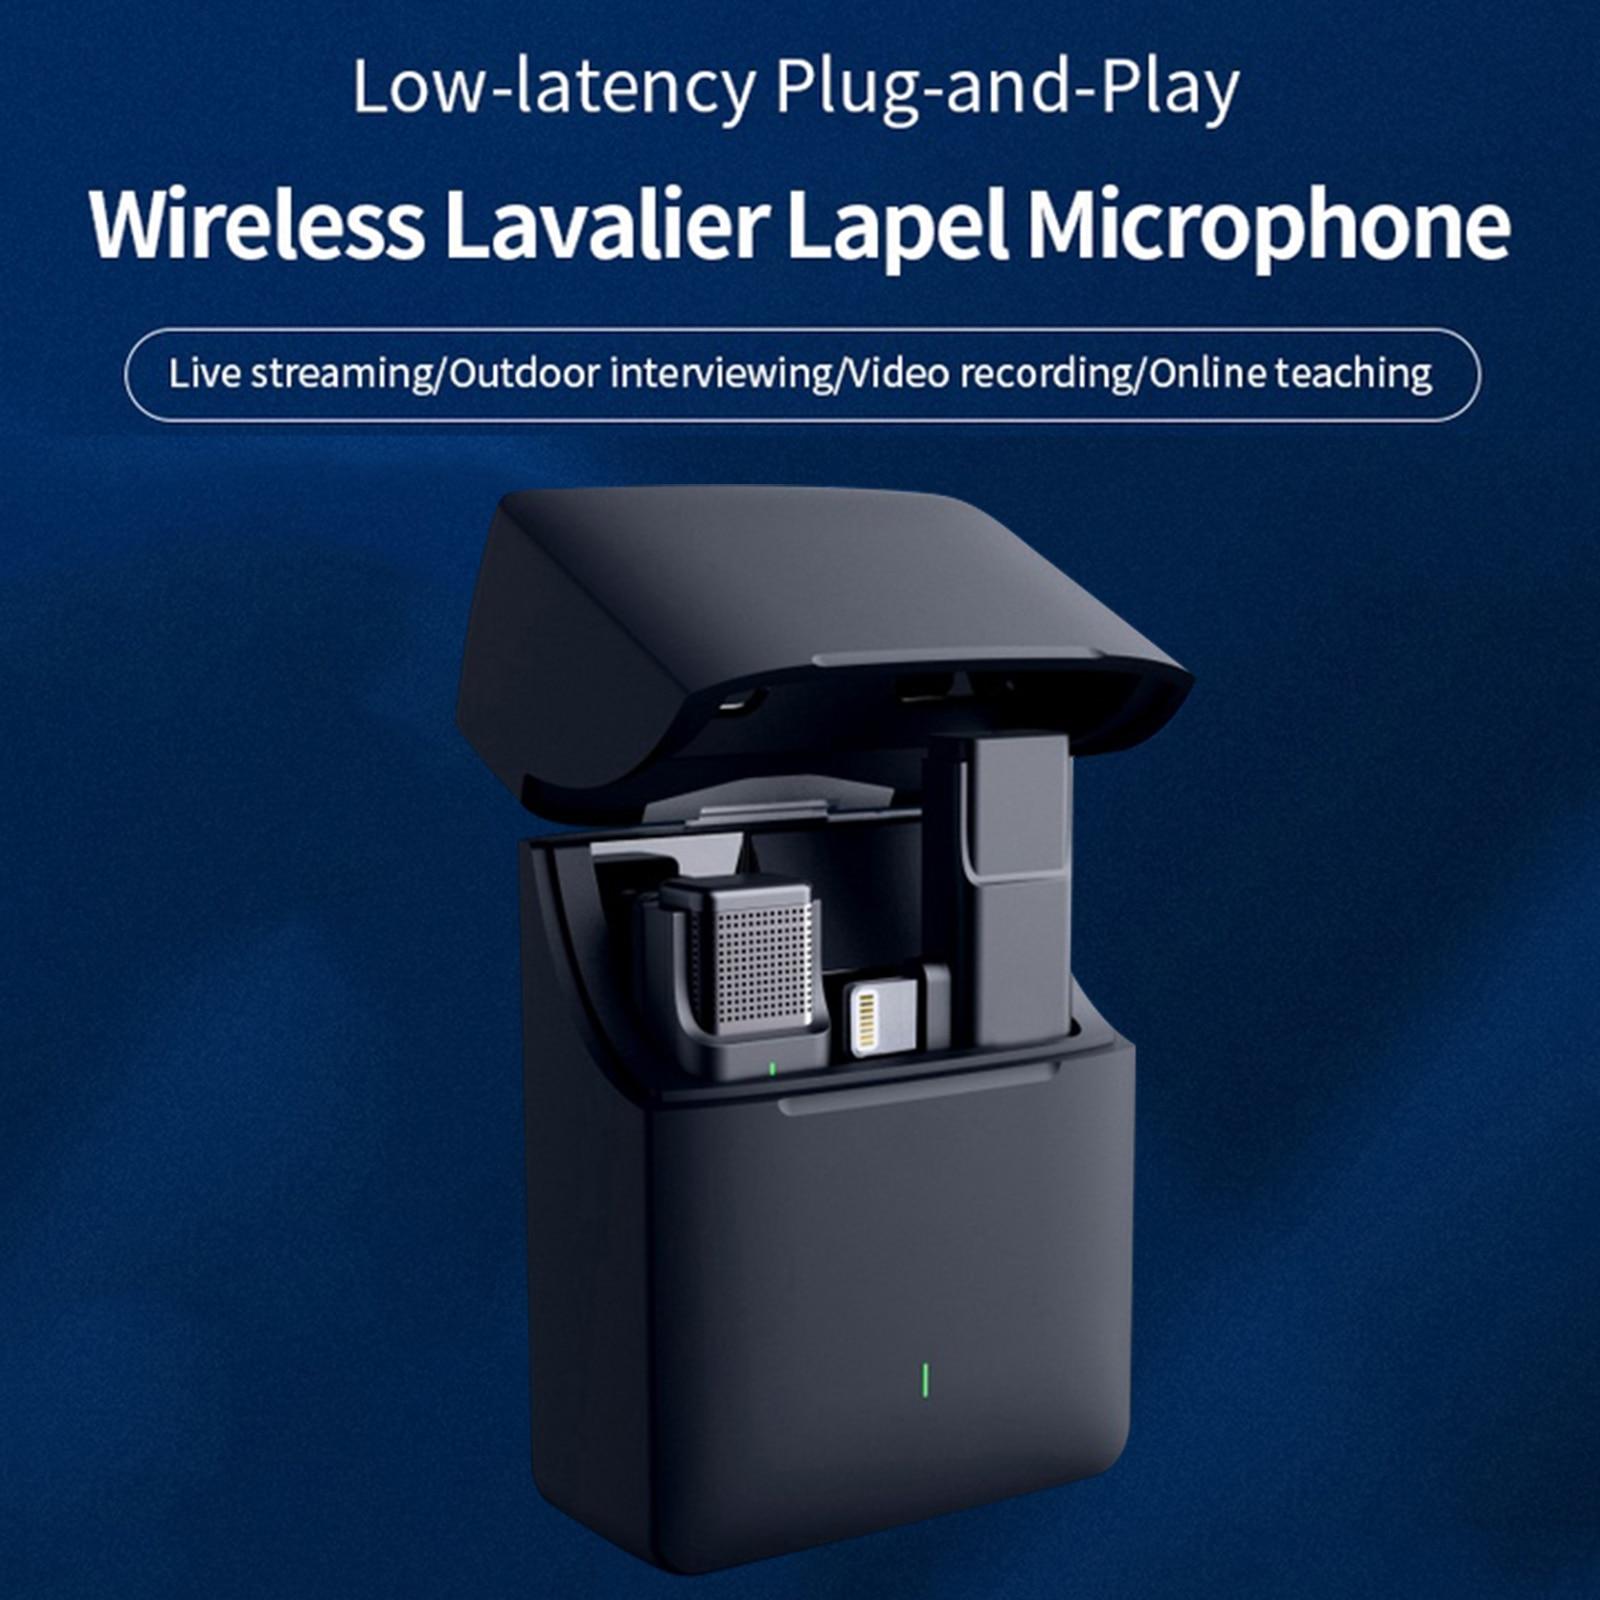 ميكروفون Lavalier لاسلكي جديد لعام 2021 لهاتف IPhone IPad Plug مع ميكروفون ببطارية 2.4 جيجاهرتز مع حافظة شحن لهاتف TikTok YouTube Facebook Vlog